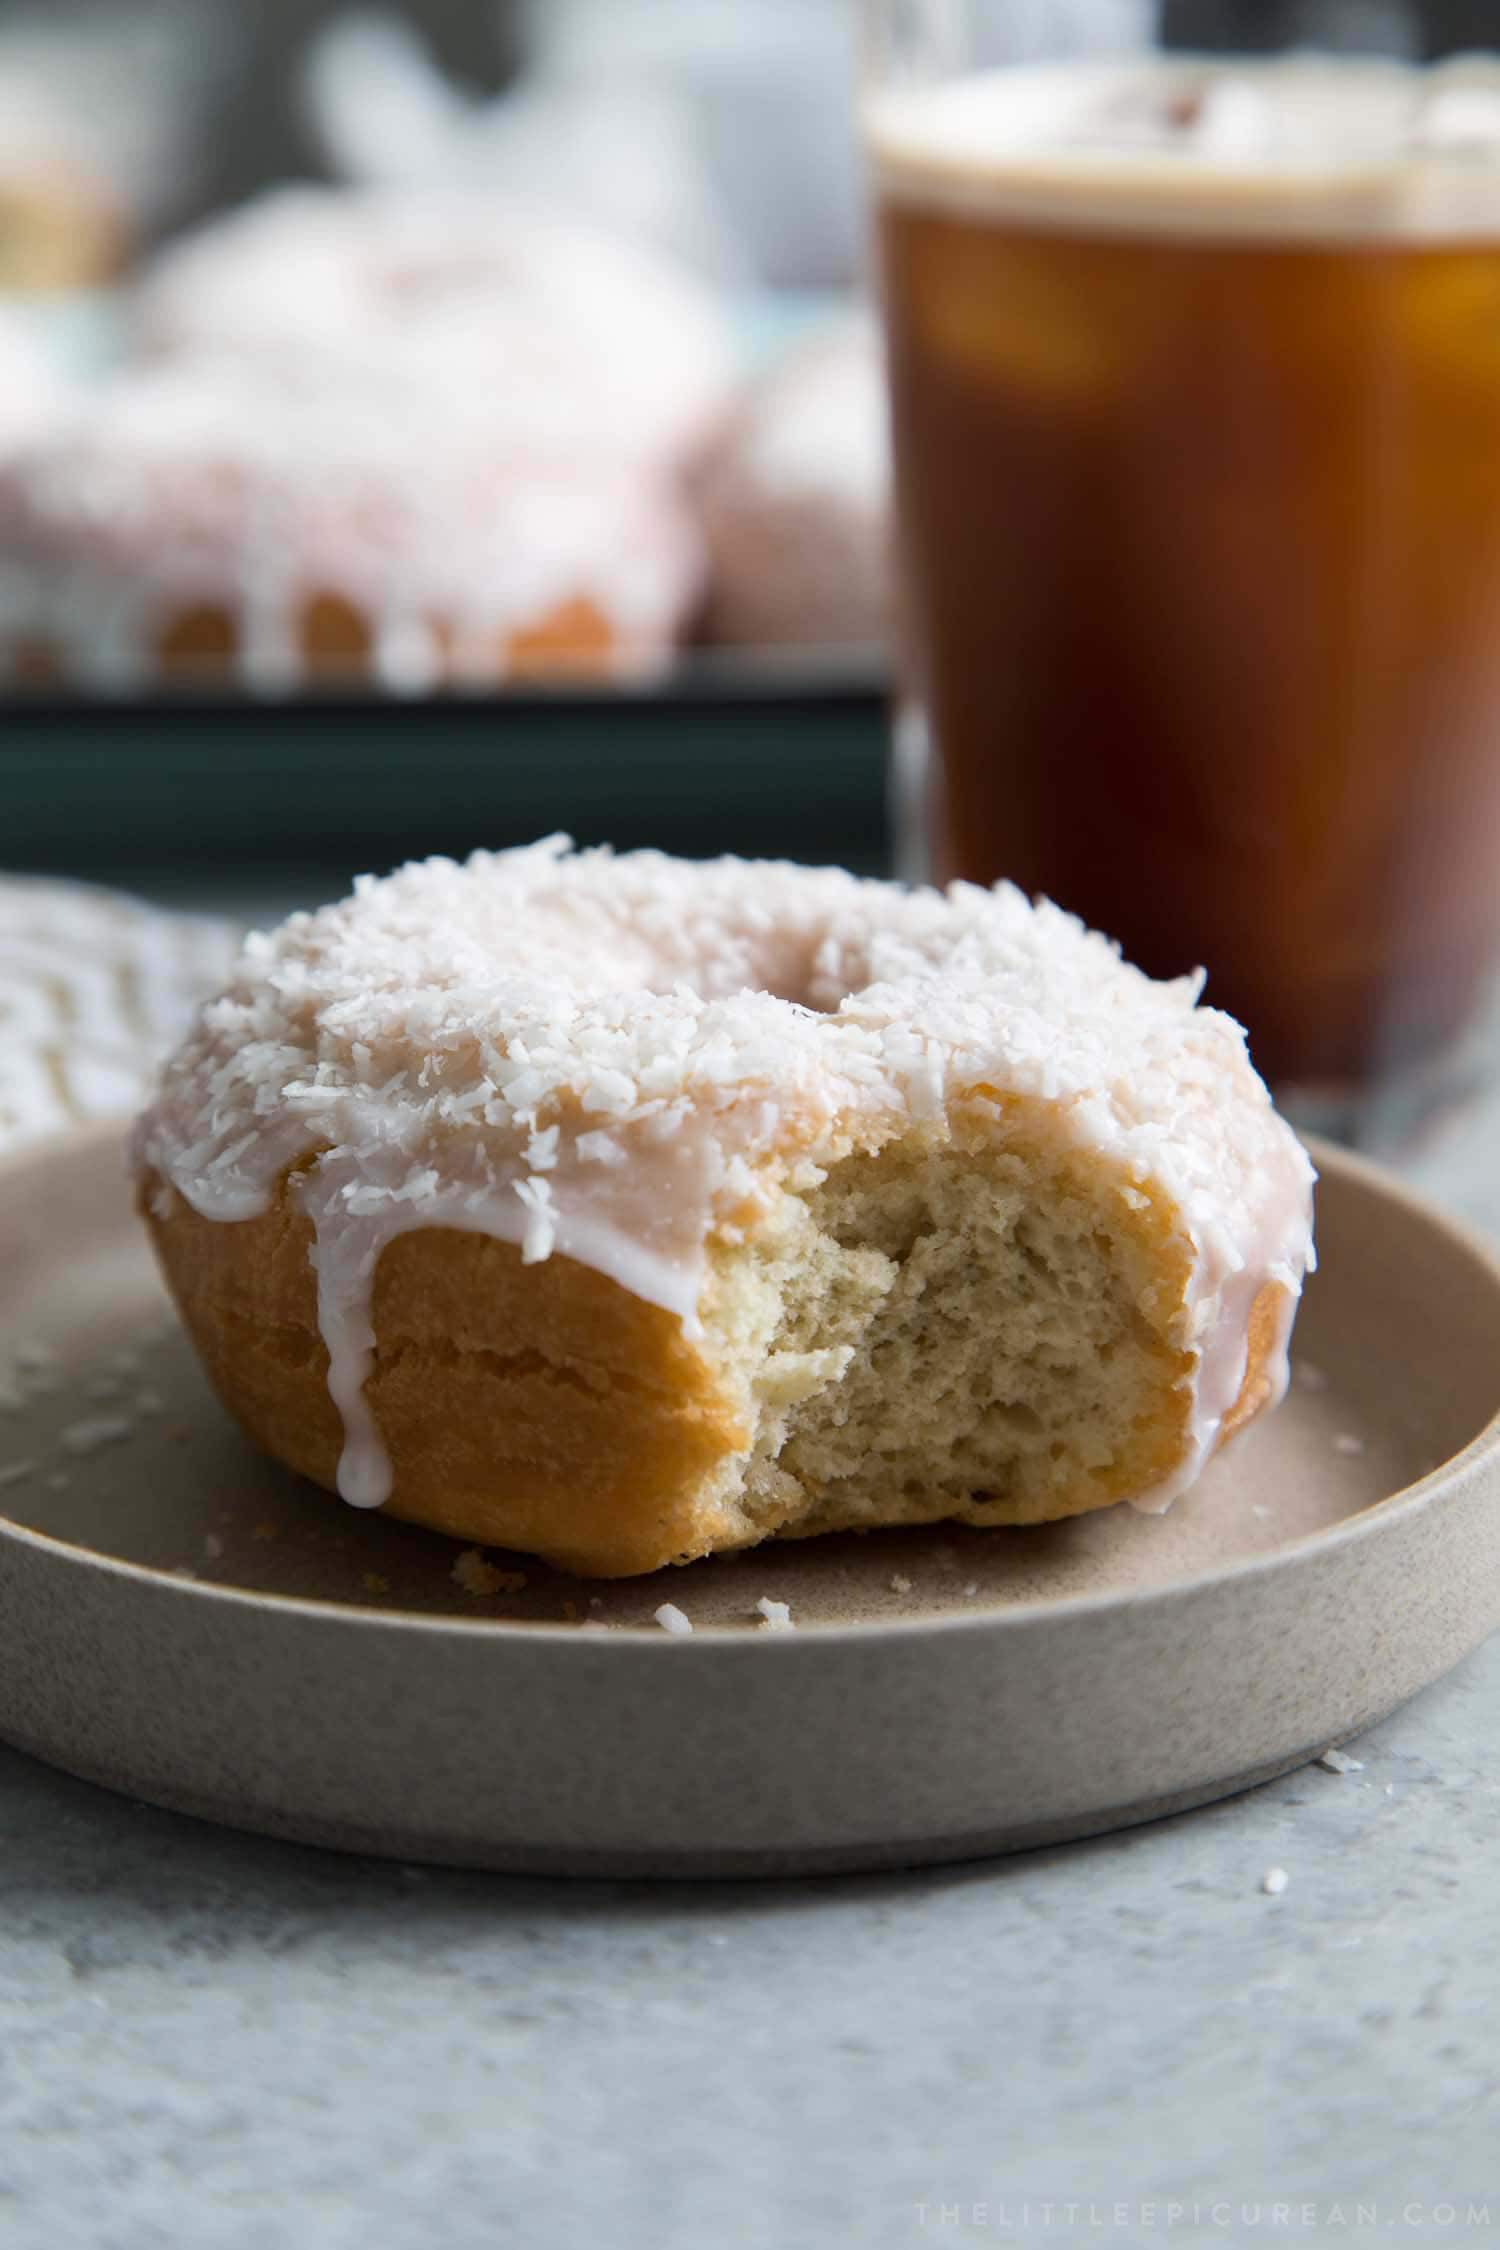 Coconut Cake Doughnuts with Coconut Milk Glaze